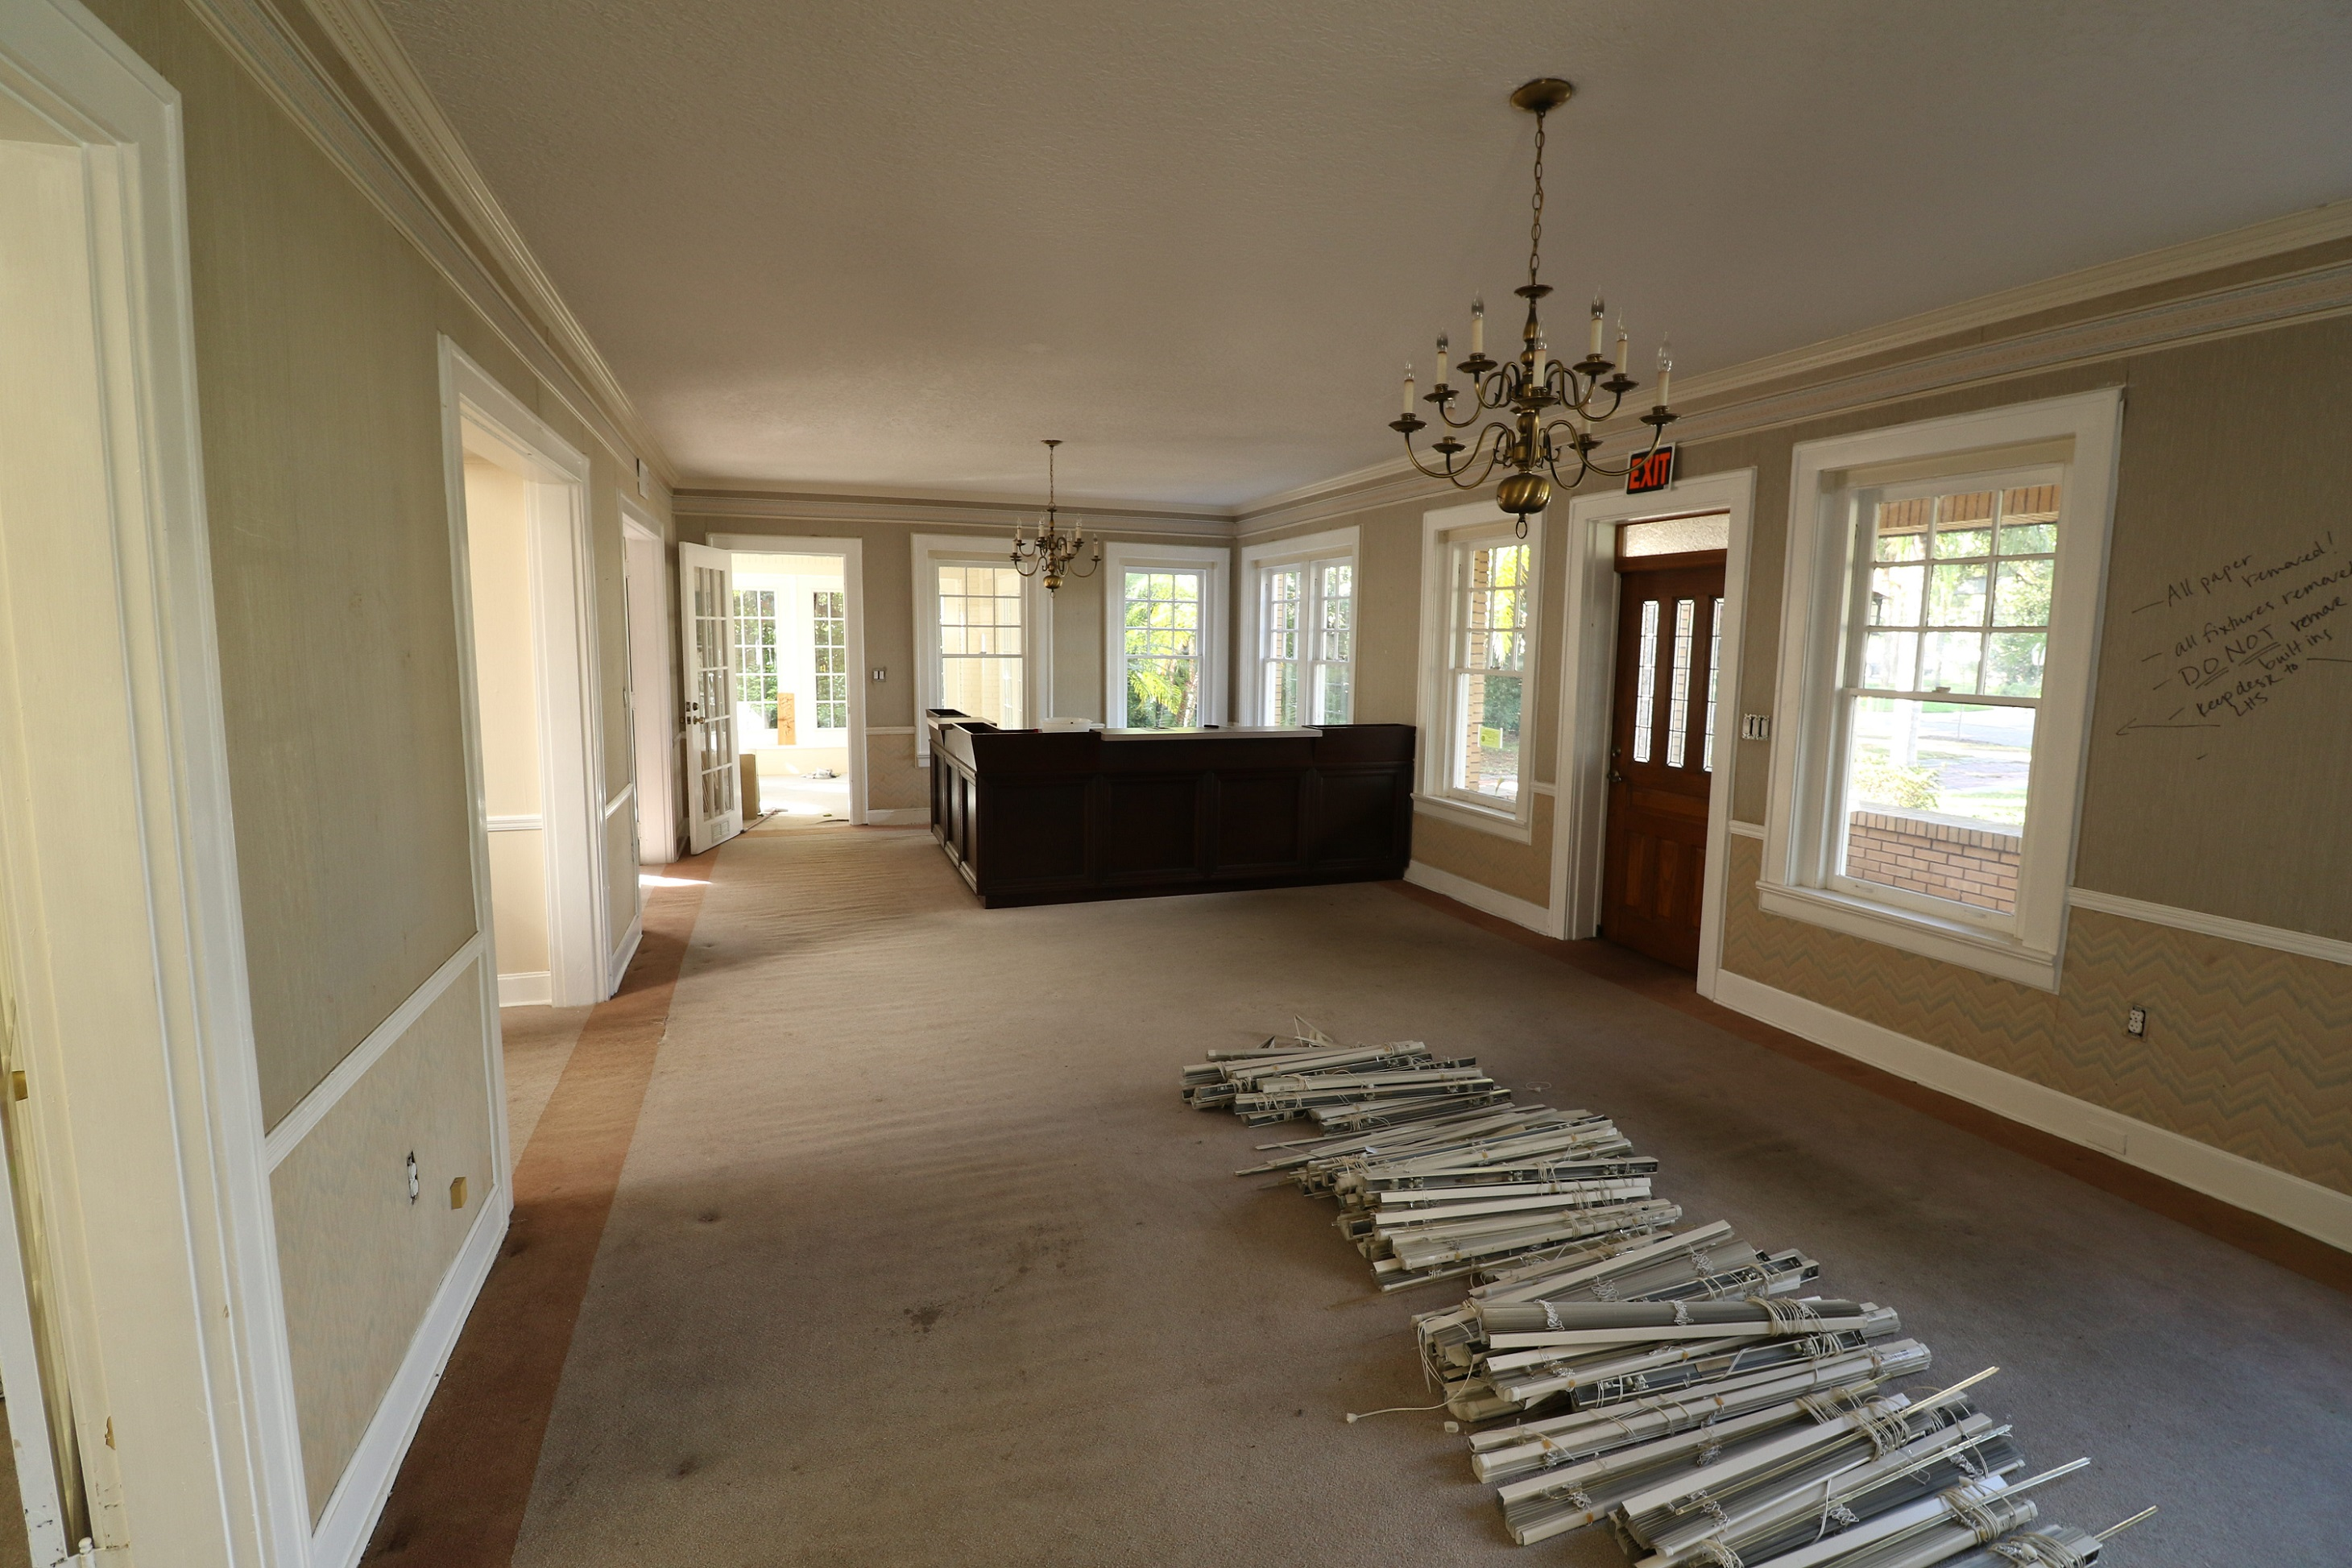 hillcrestfrontroom